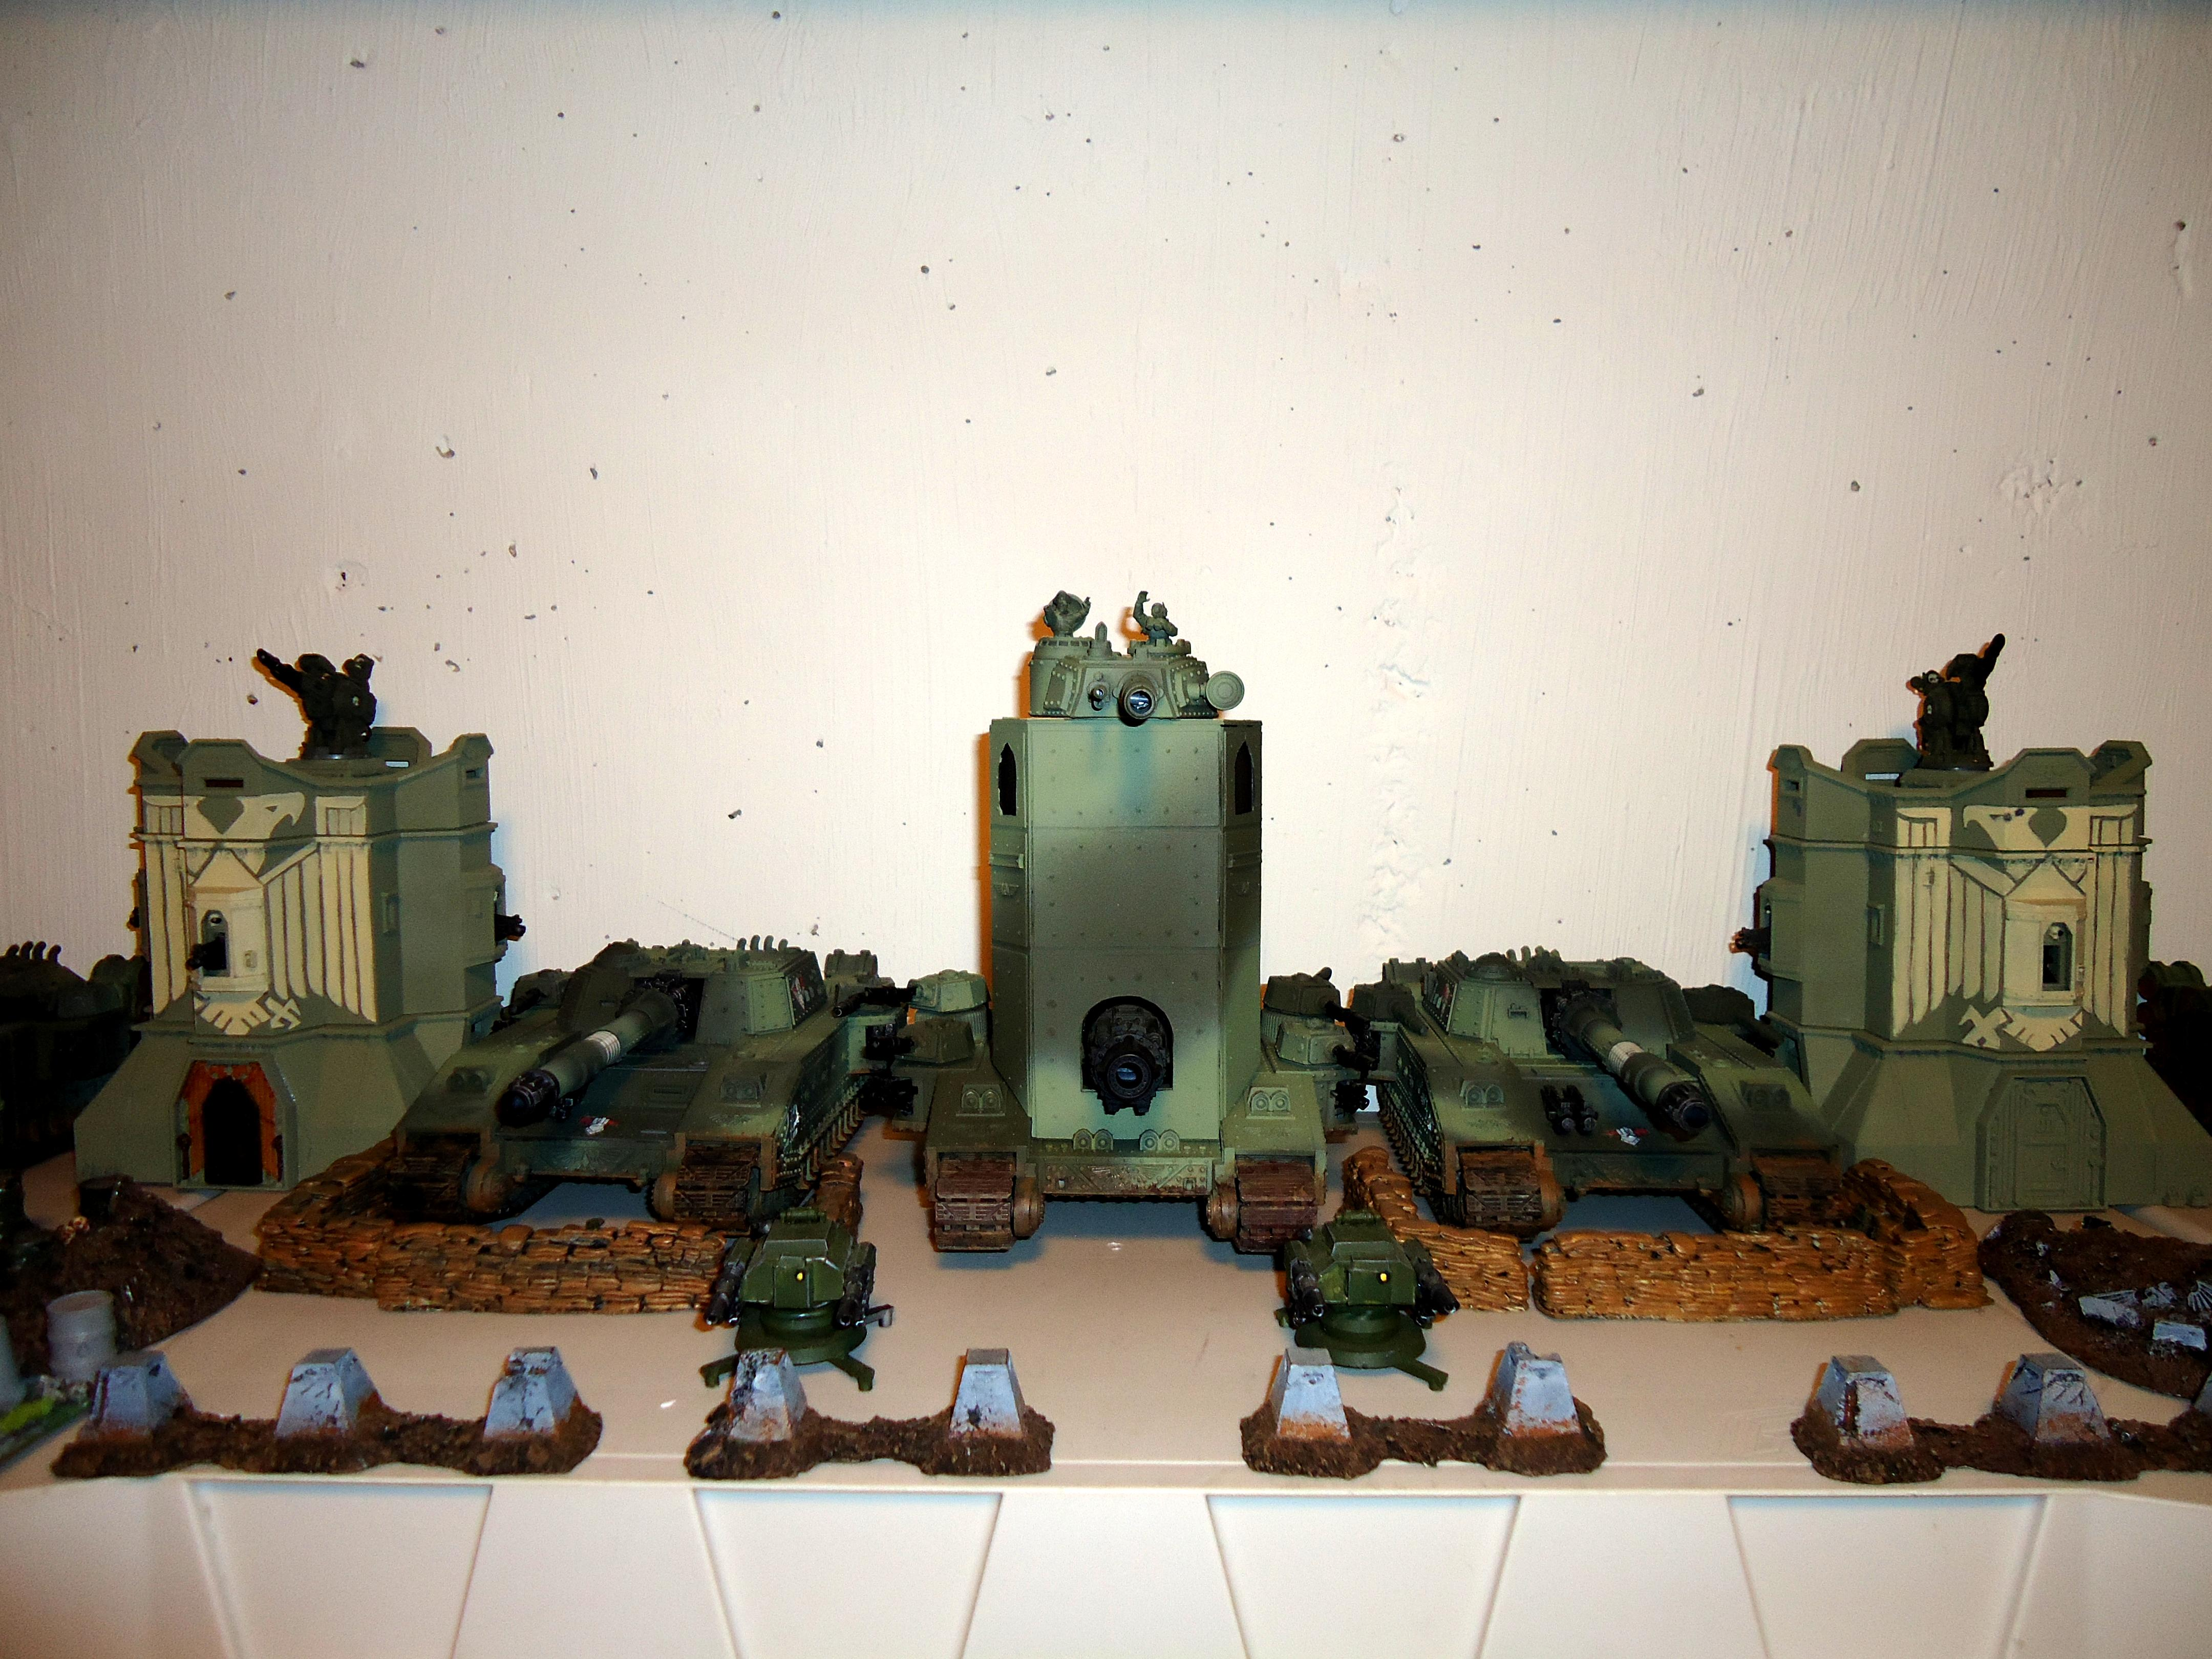 Apocalypse, Armor, Armored Company, Army, Brigade, Imperial Guard, Leviathan, Shadowsword, Super-heavy, Tank, Work In Progress